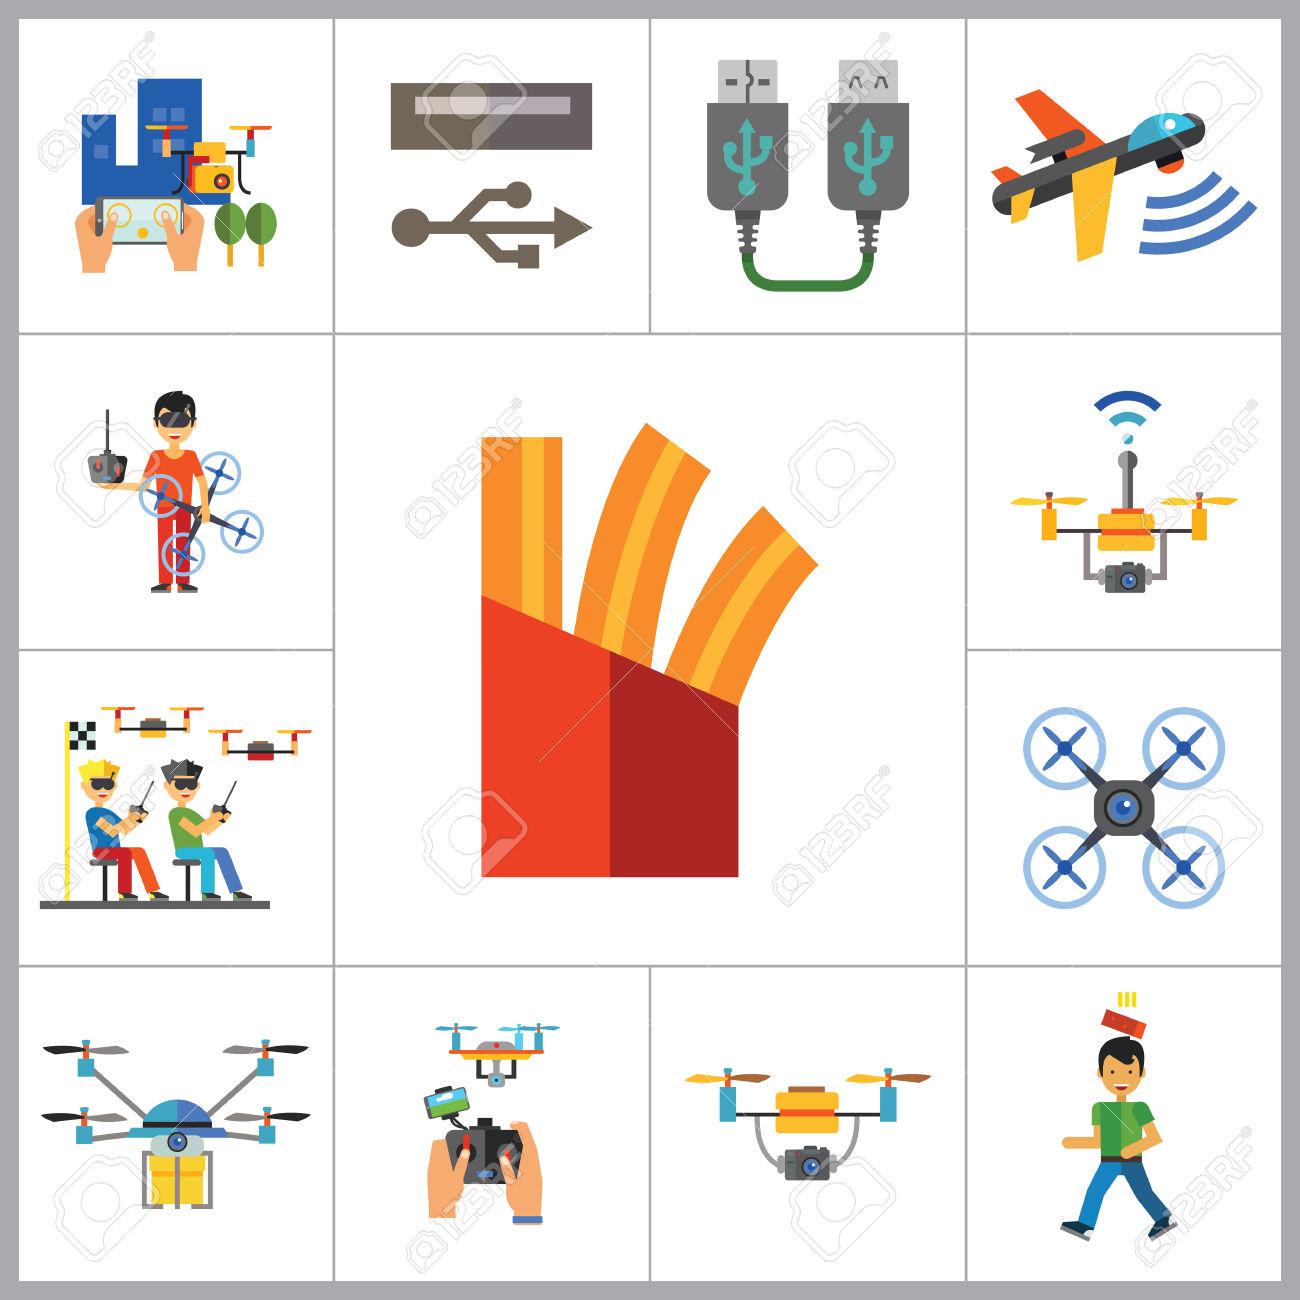 Drones Icon Set. Drone Technology Drone Surveillance Drone Racing.